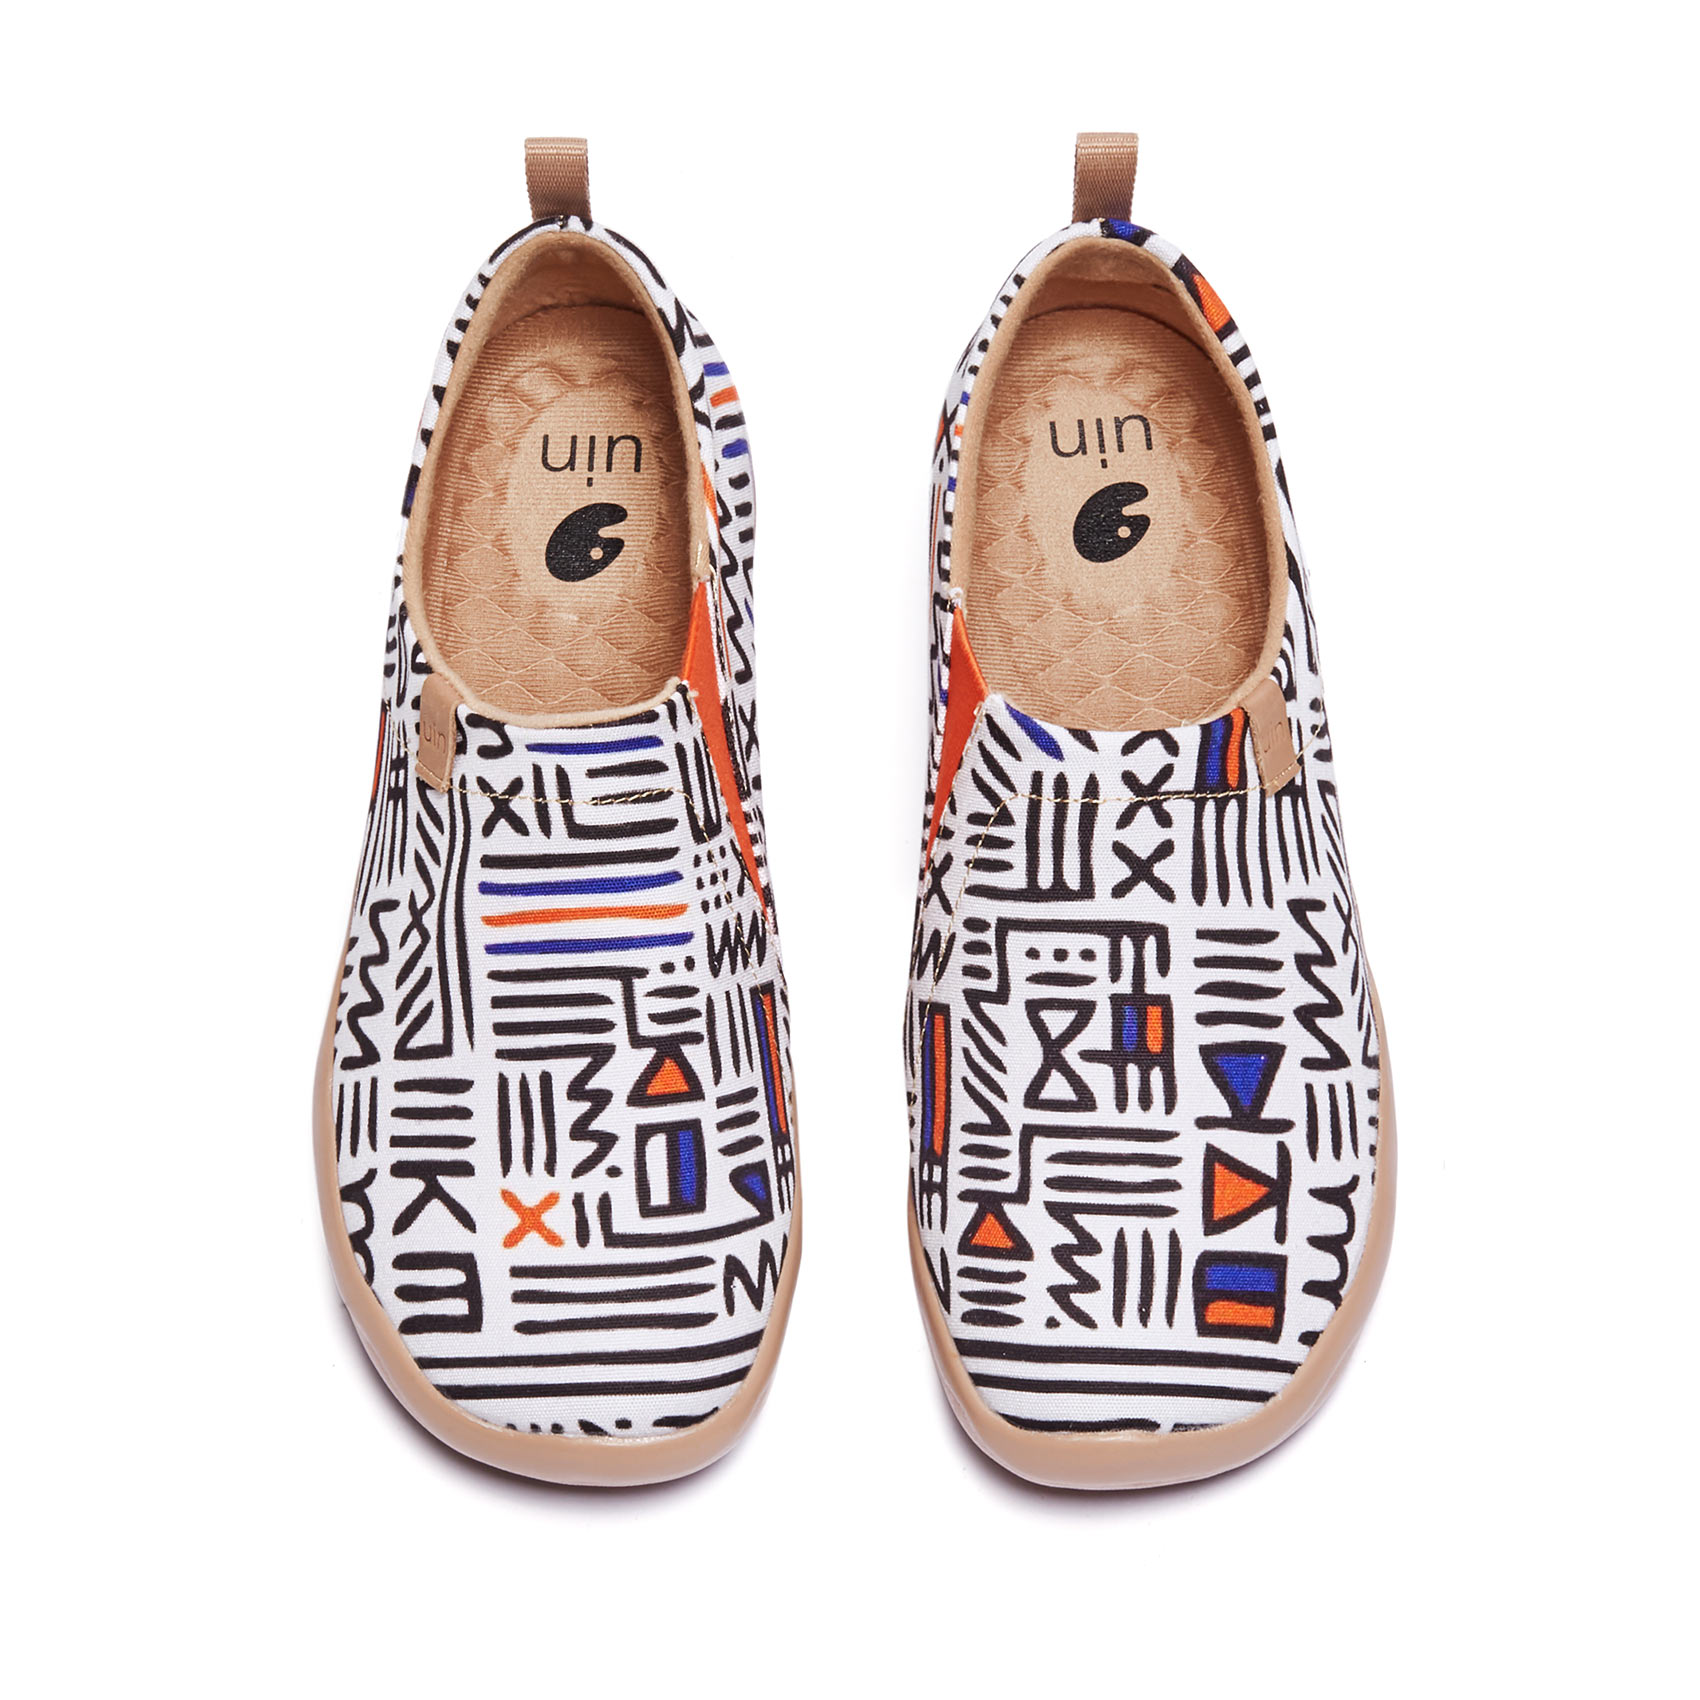 UIN المرأة الانزلاق على أحذية رياضية حذاء بدون كعب حك الفن رسمت الراحة أحذية مشي لينة استكشاف المكسيك